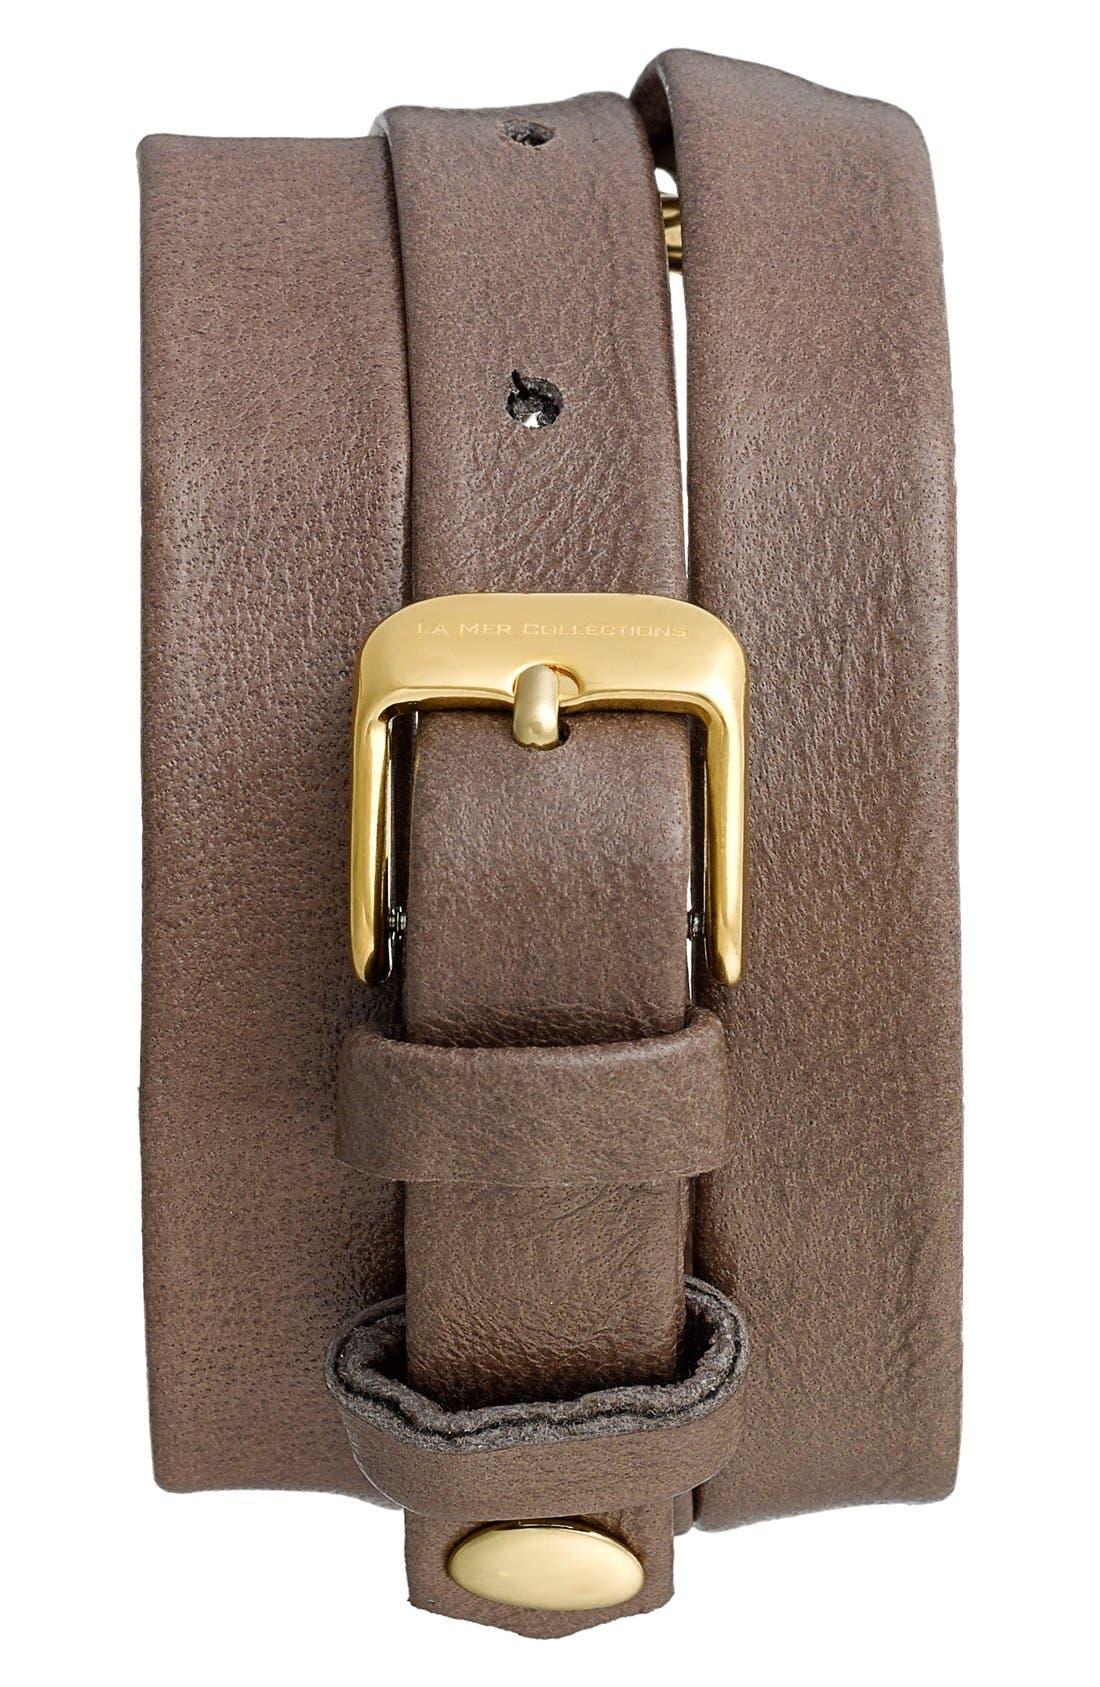 Alternate Image 2  - La Mer Collections 'Smokey Quartz' Leather Wrap Bracelet Watch, 42mm x 40mm